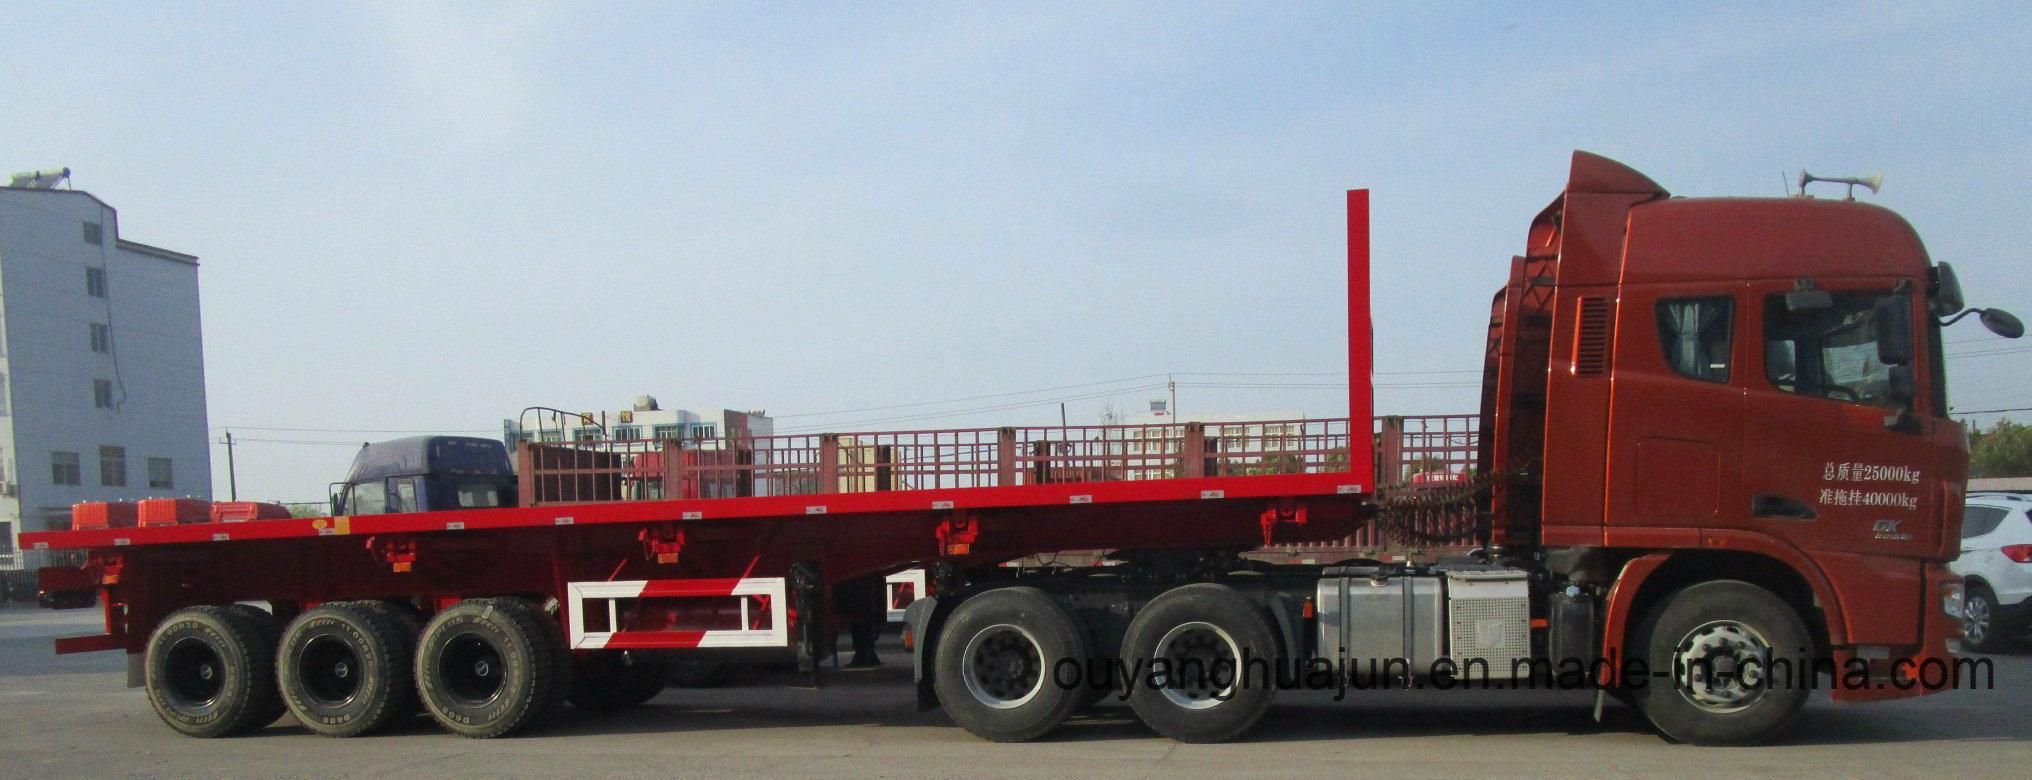 Rear Tipper Platform Self Dump Semitrailer